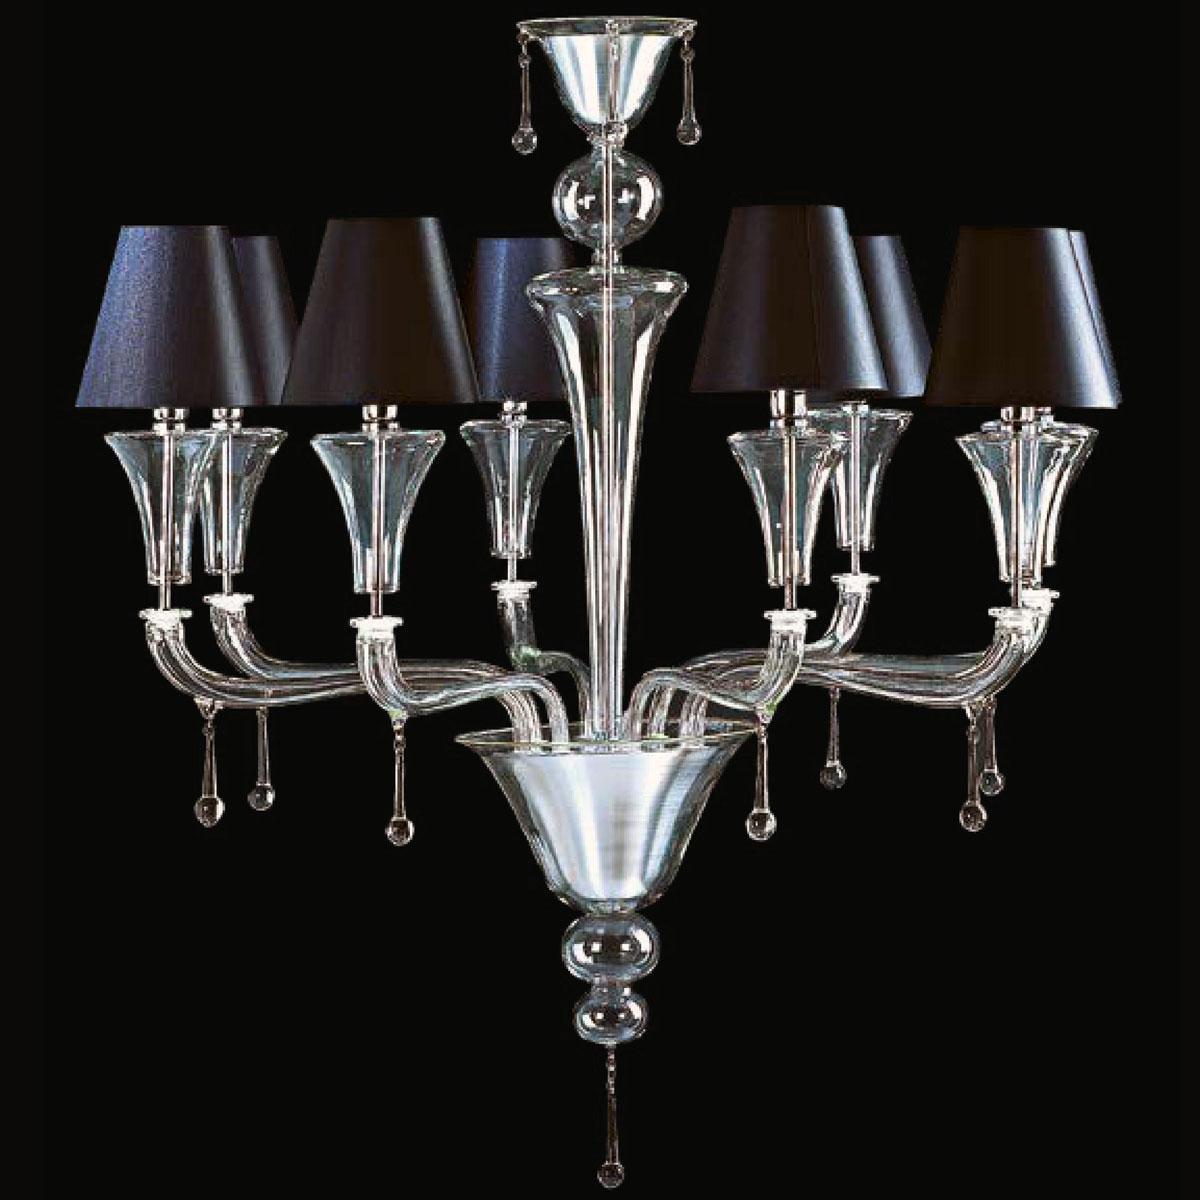 """Elliott"" Murano glass chandelier with lampshades - 8 lights - transparent"